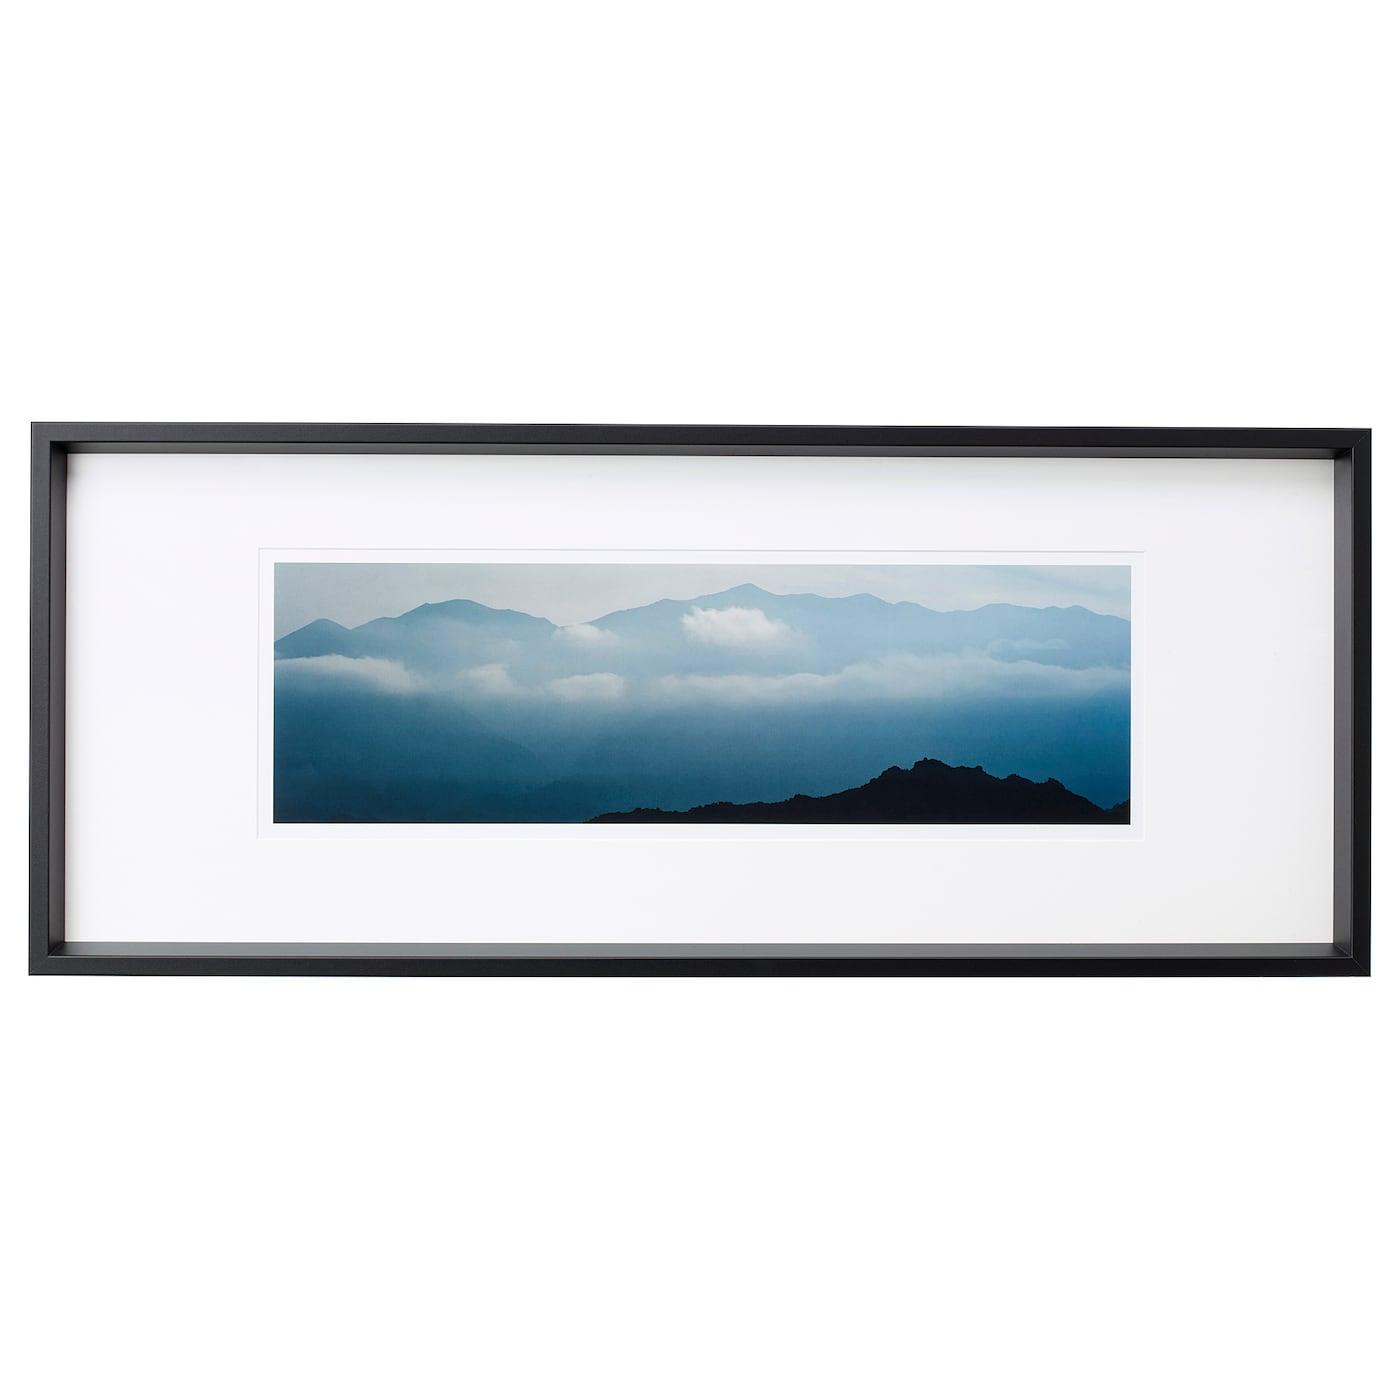 Olunda Picture Mountain View 94×38 5 Cm Ikea